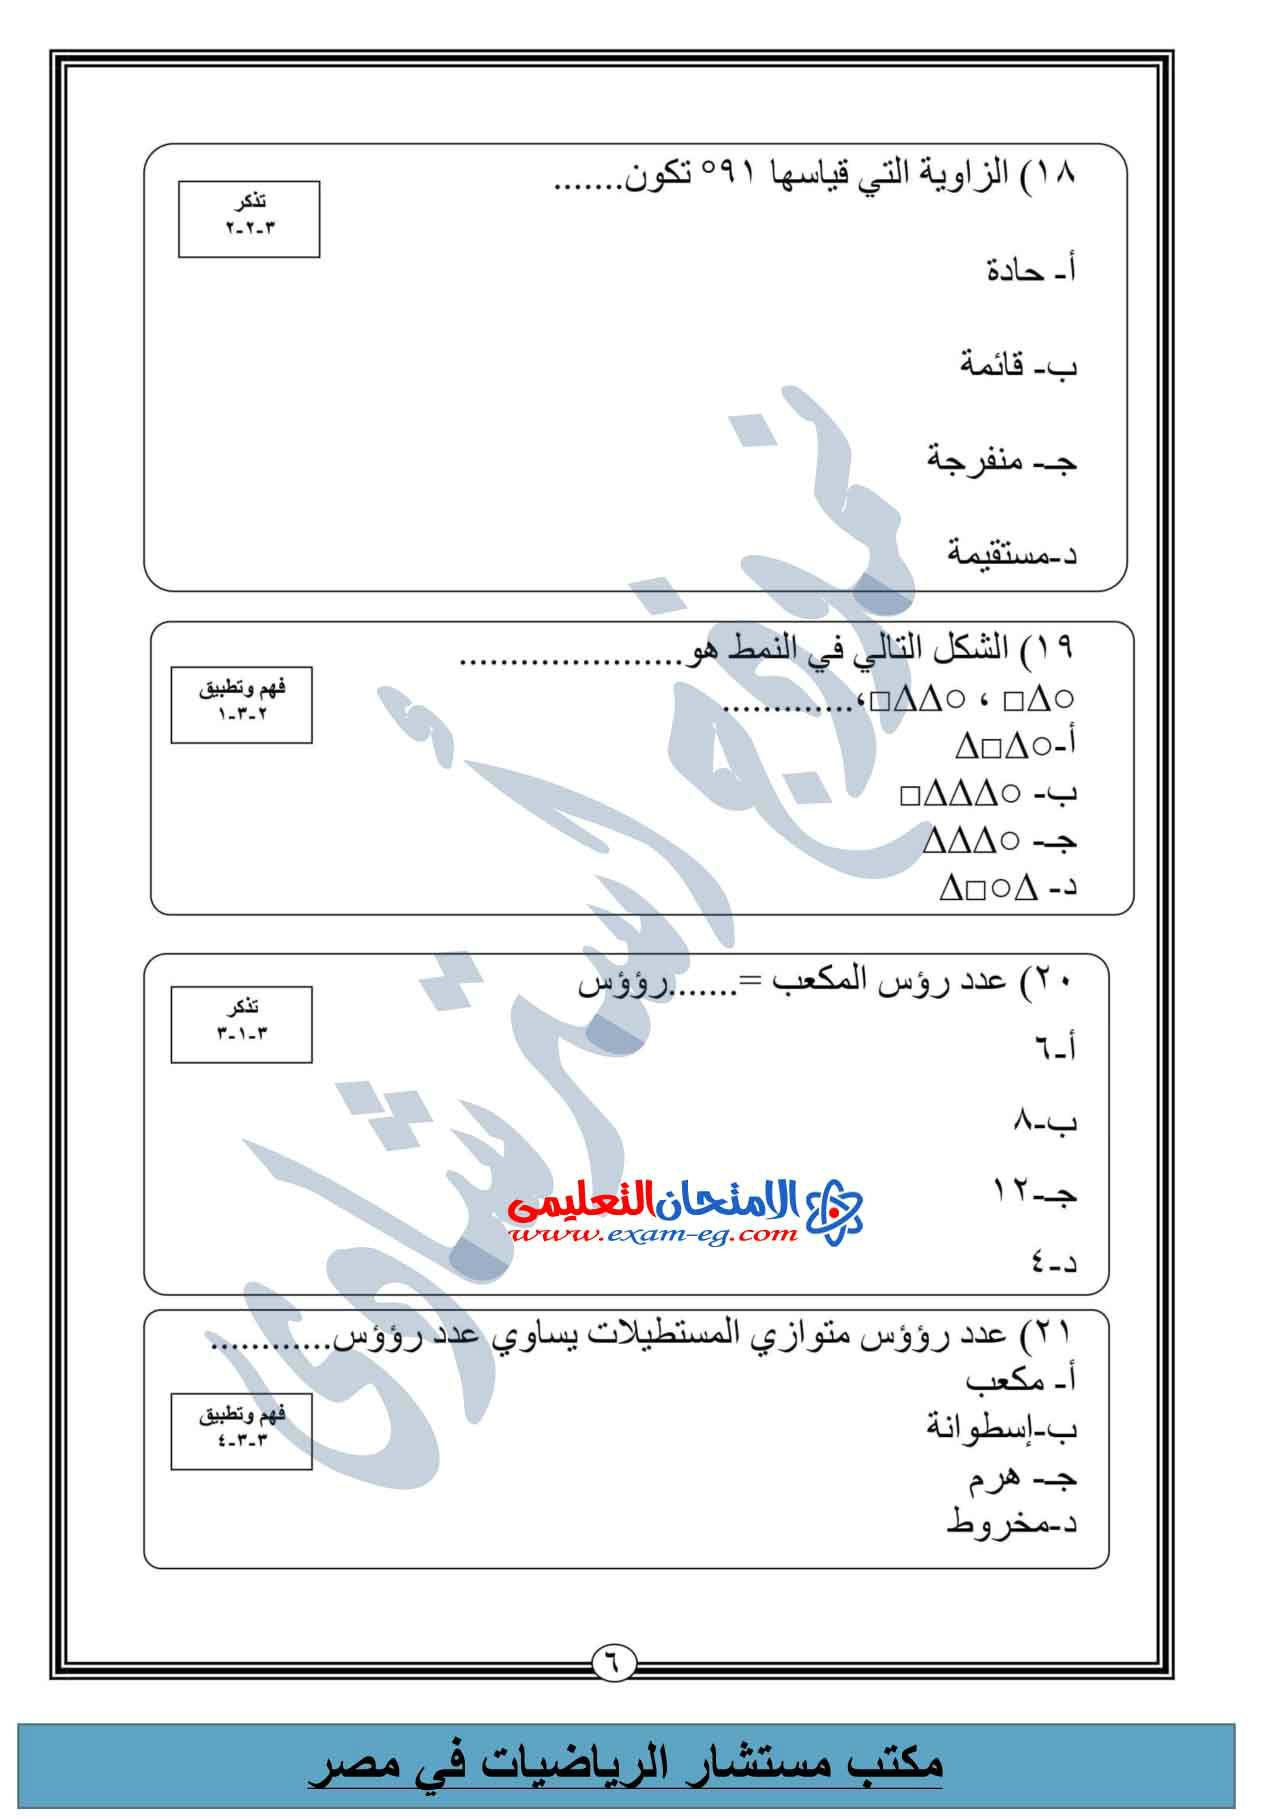 exam-eg.com_14492420350612.jpg